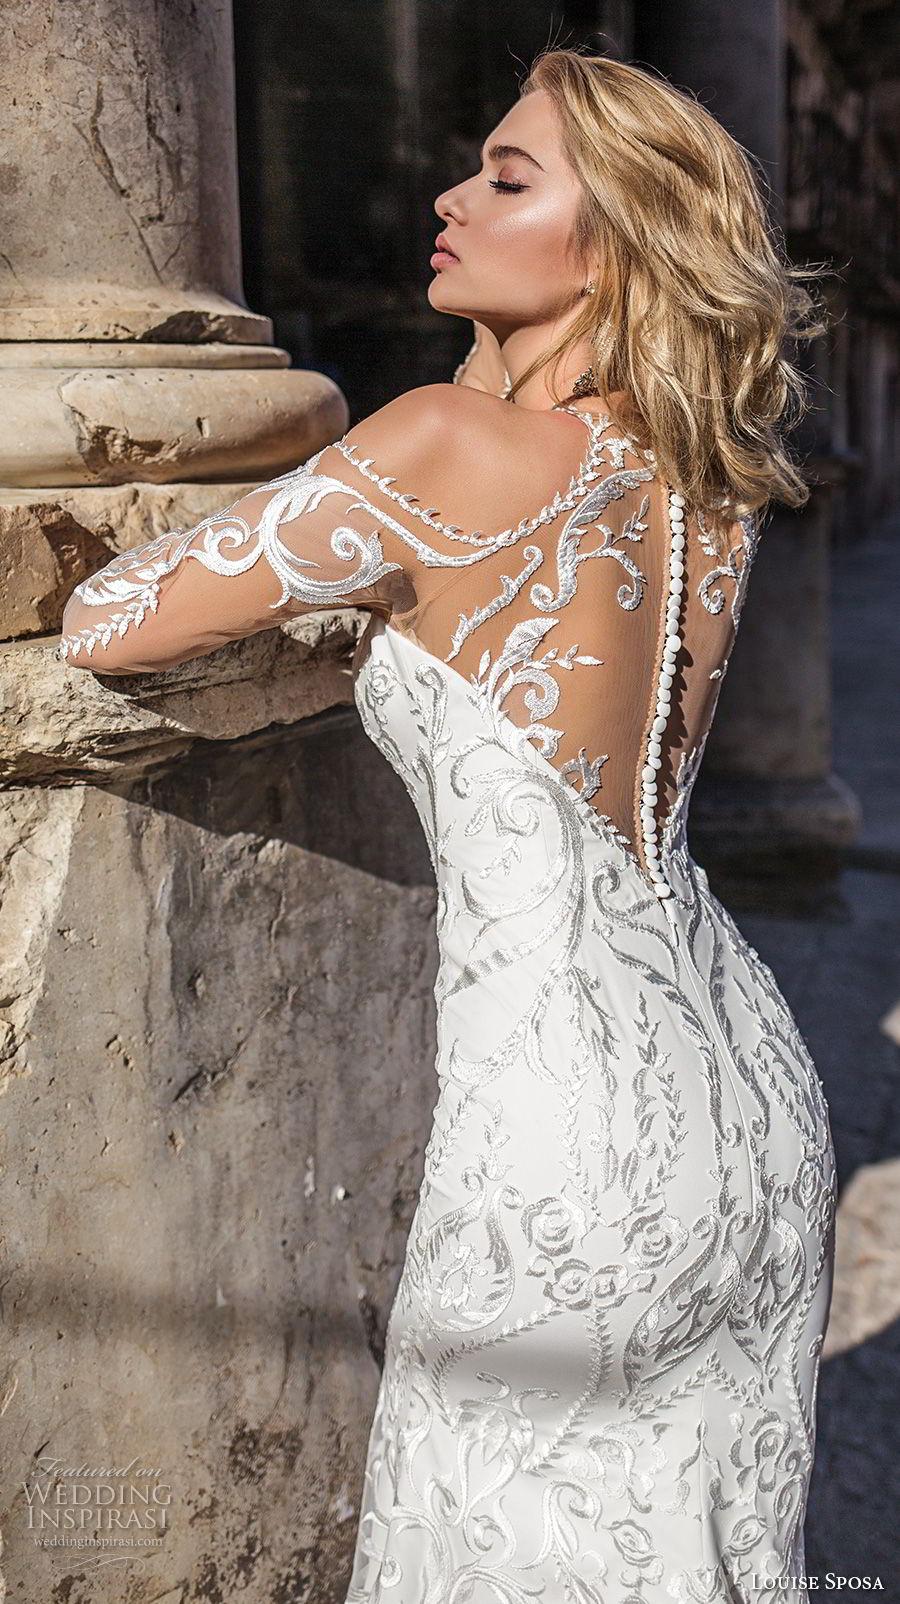 louise sposa 2018 bridal long sleeves cold shoulder halter sweetheart neck full embellishment elegant glamorous sheathw wedding dress sheer lace back medium train (12) bv